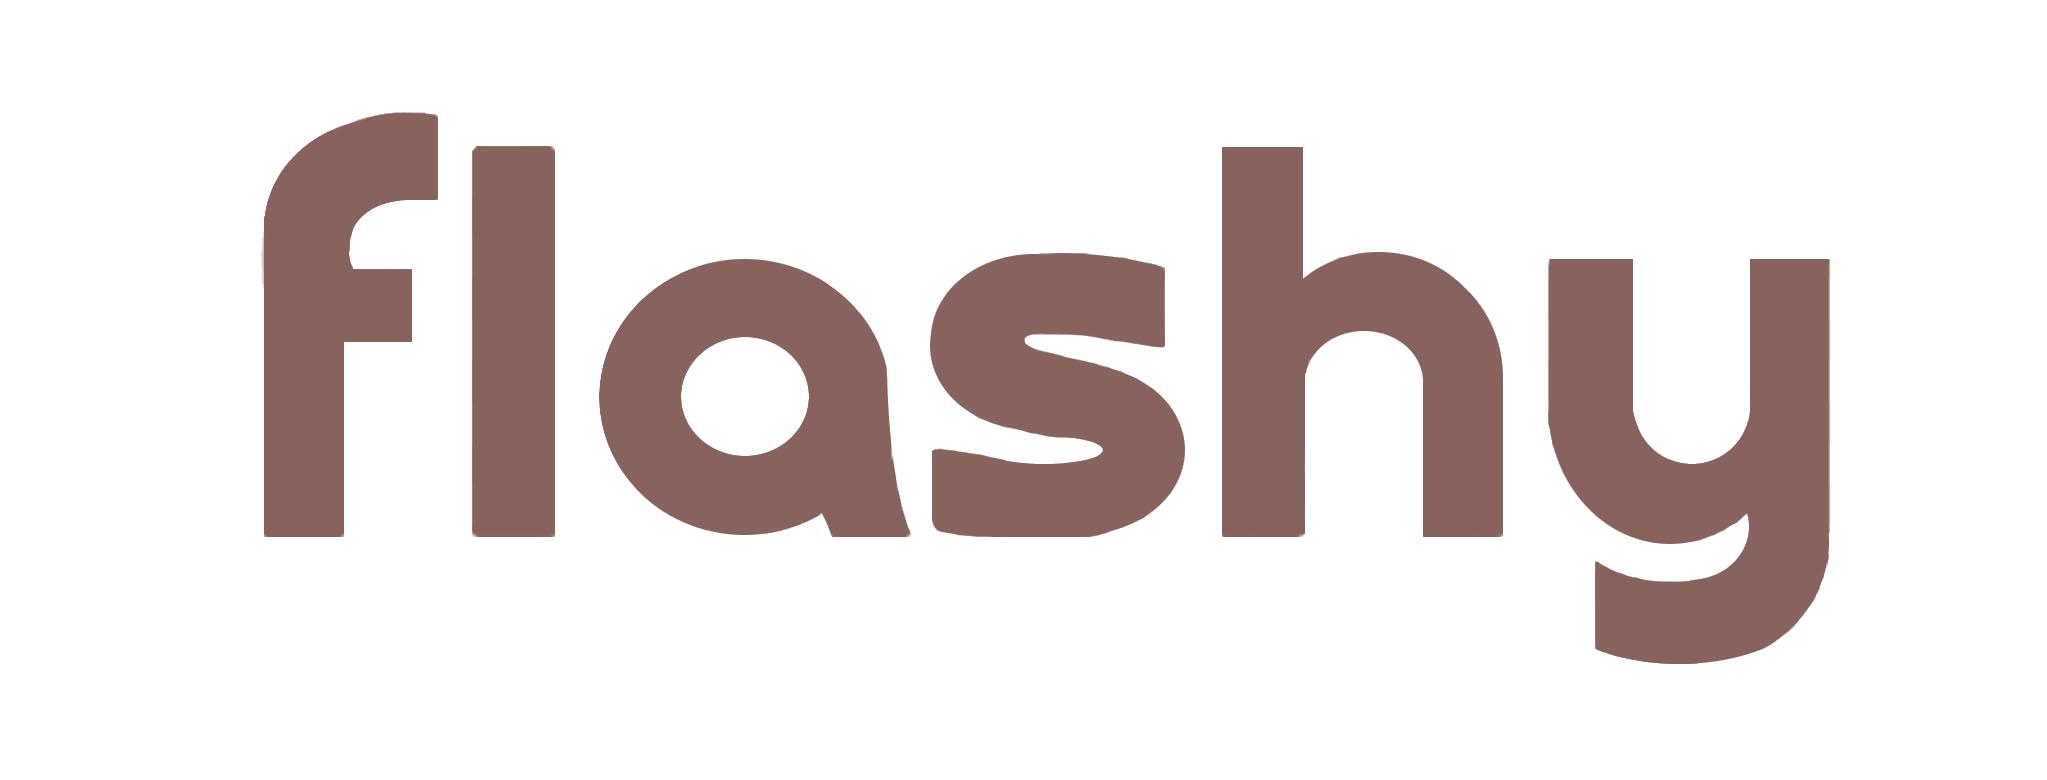 flashy logo